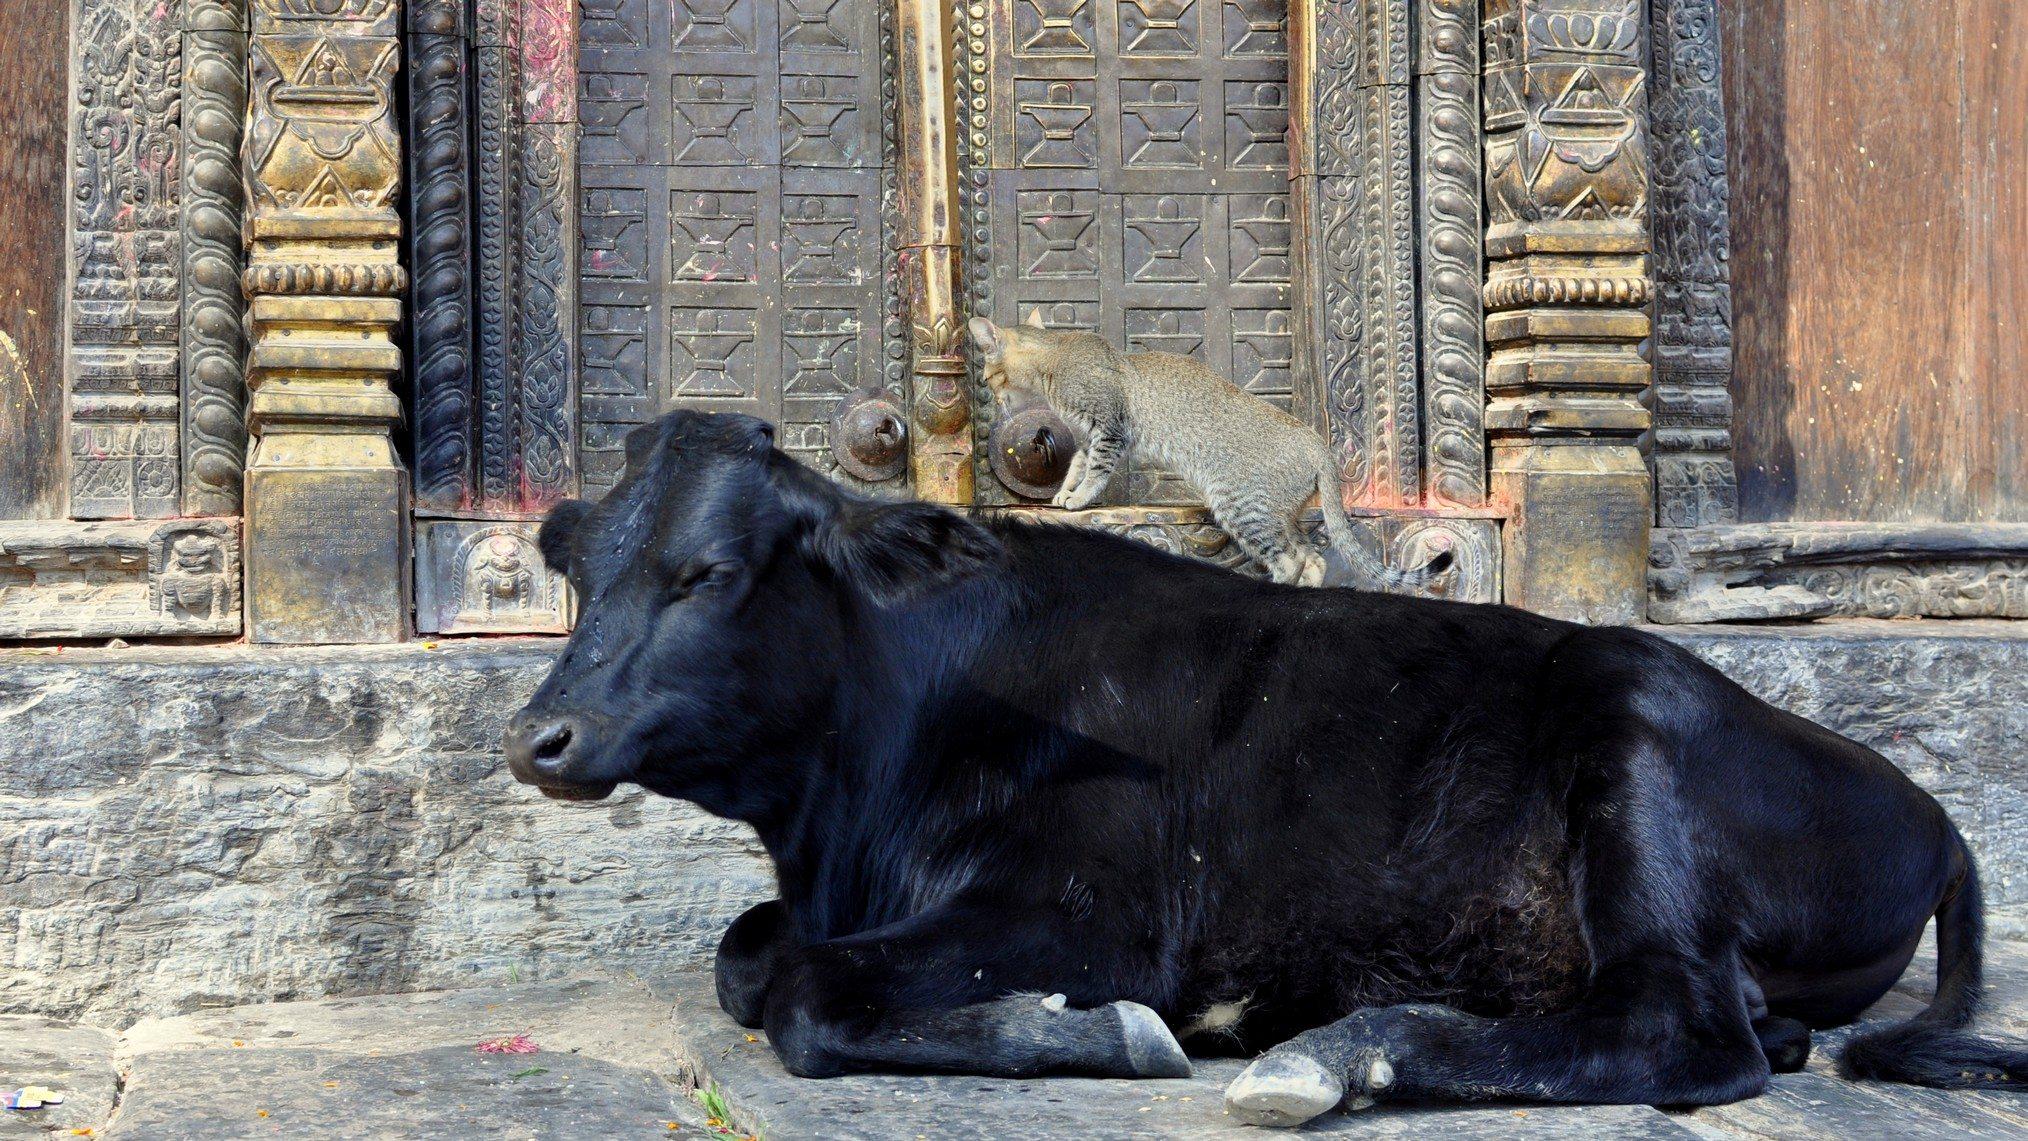 Vallée de Katmandou - Temple de Gokarna Mahadev